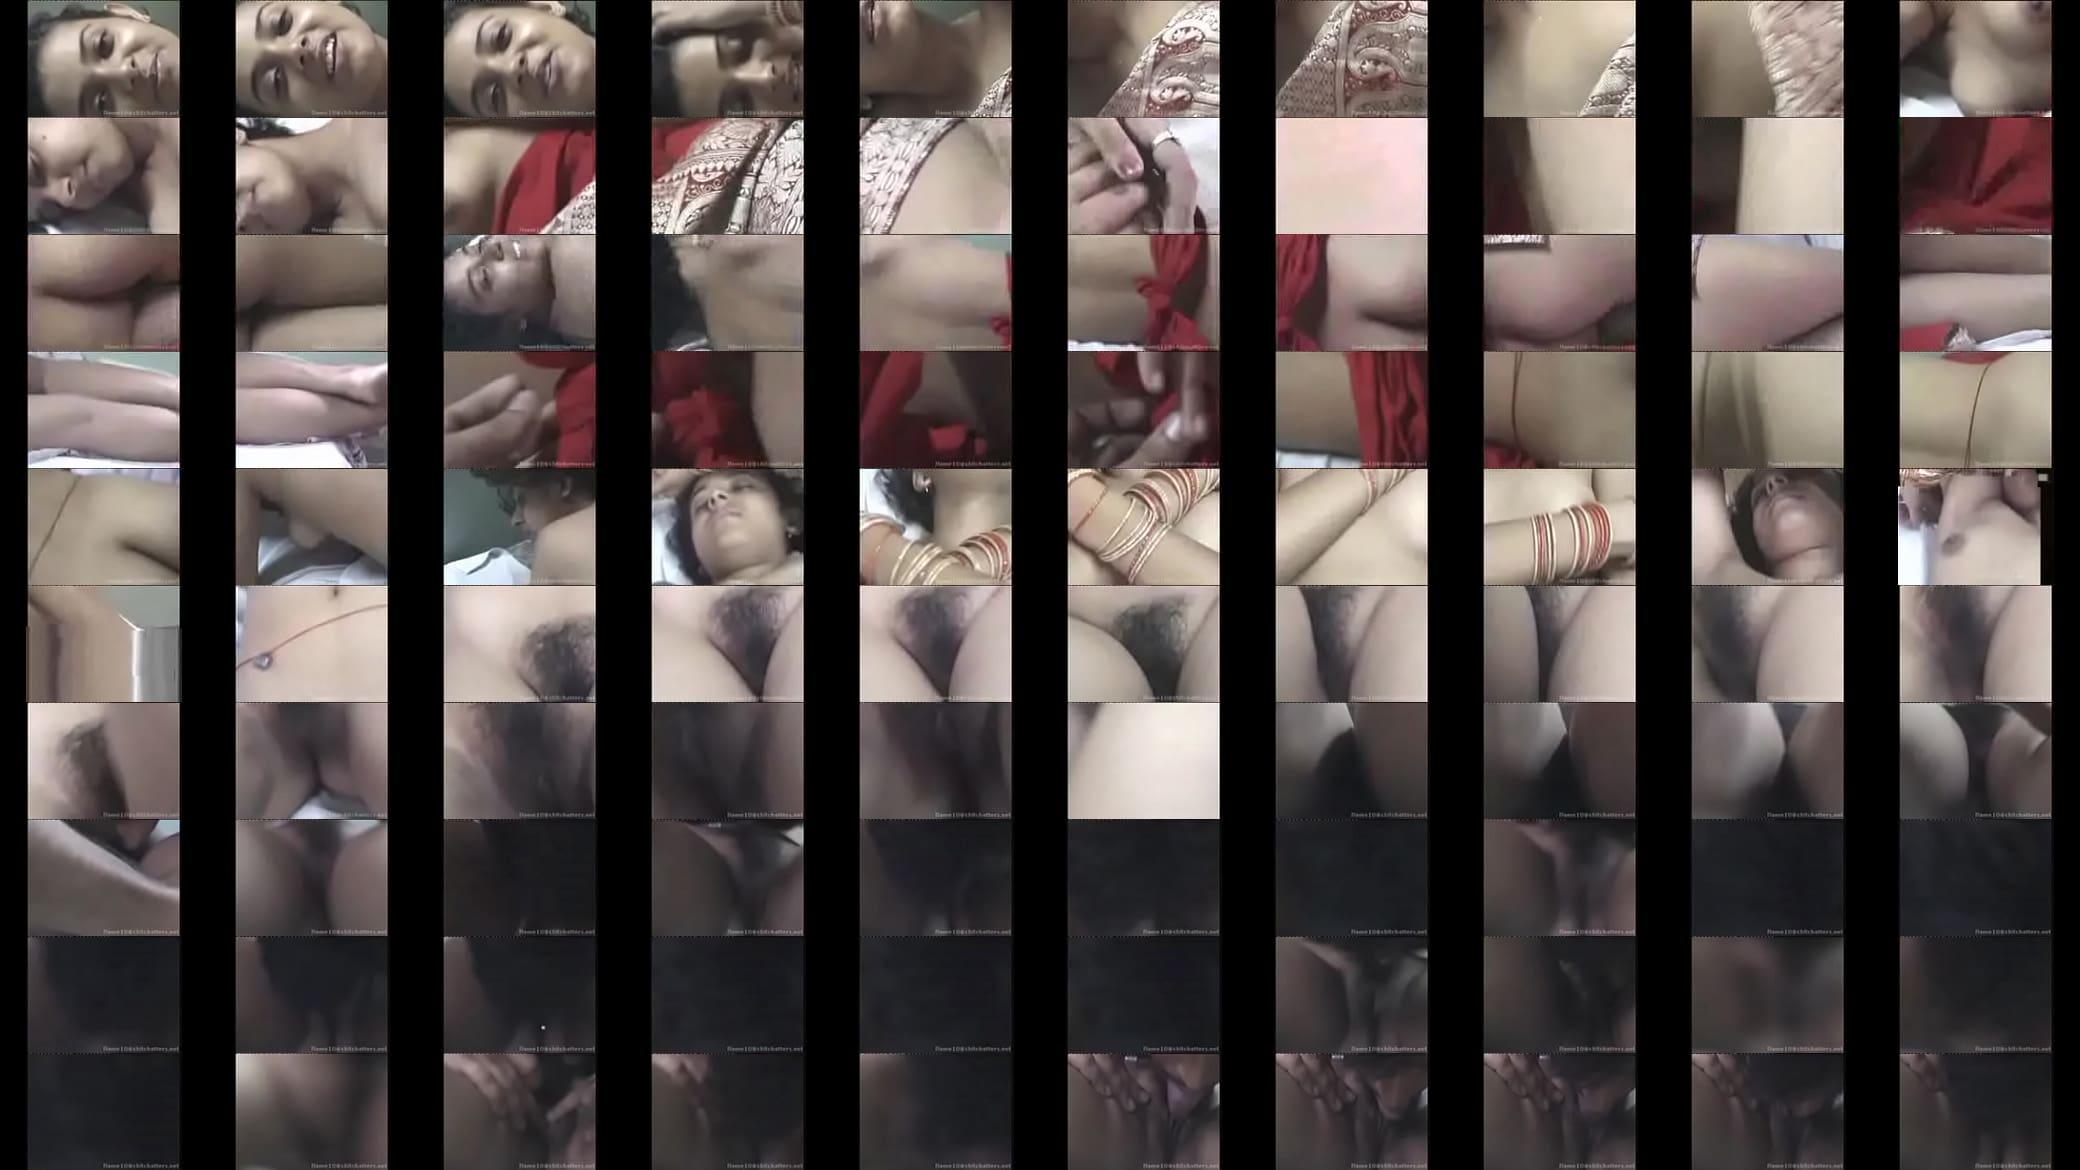 Share your sluts on fb jamshedpur commit error